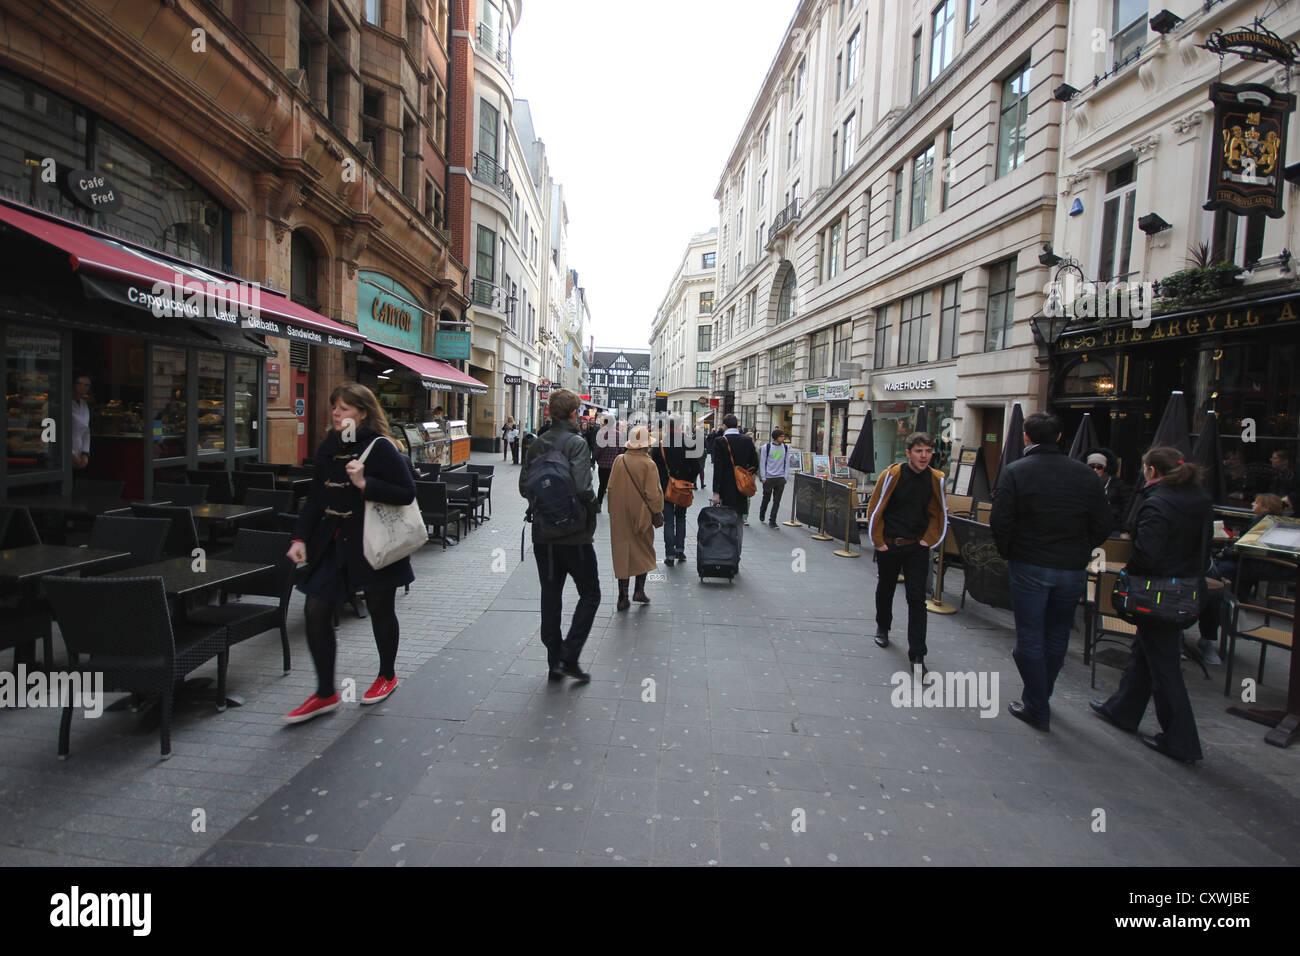 a wideangle view of Bond Street, London, England, photoarkive - Stock Image